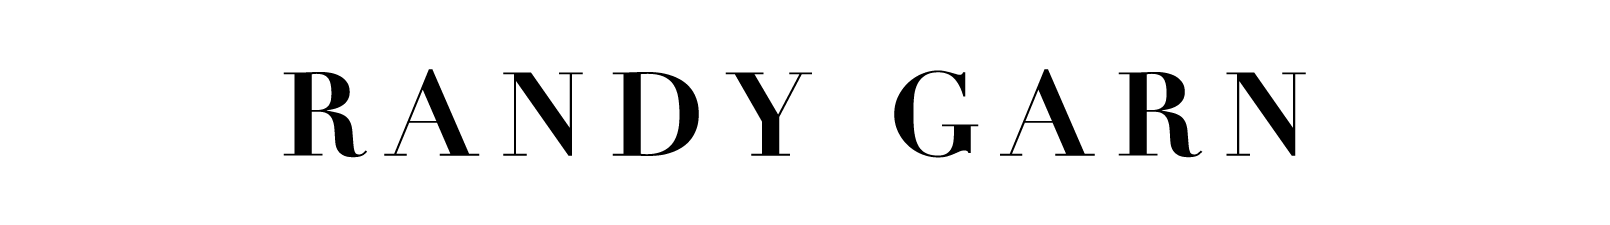 RANDY-GARN-LOGO-2.png